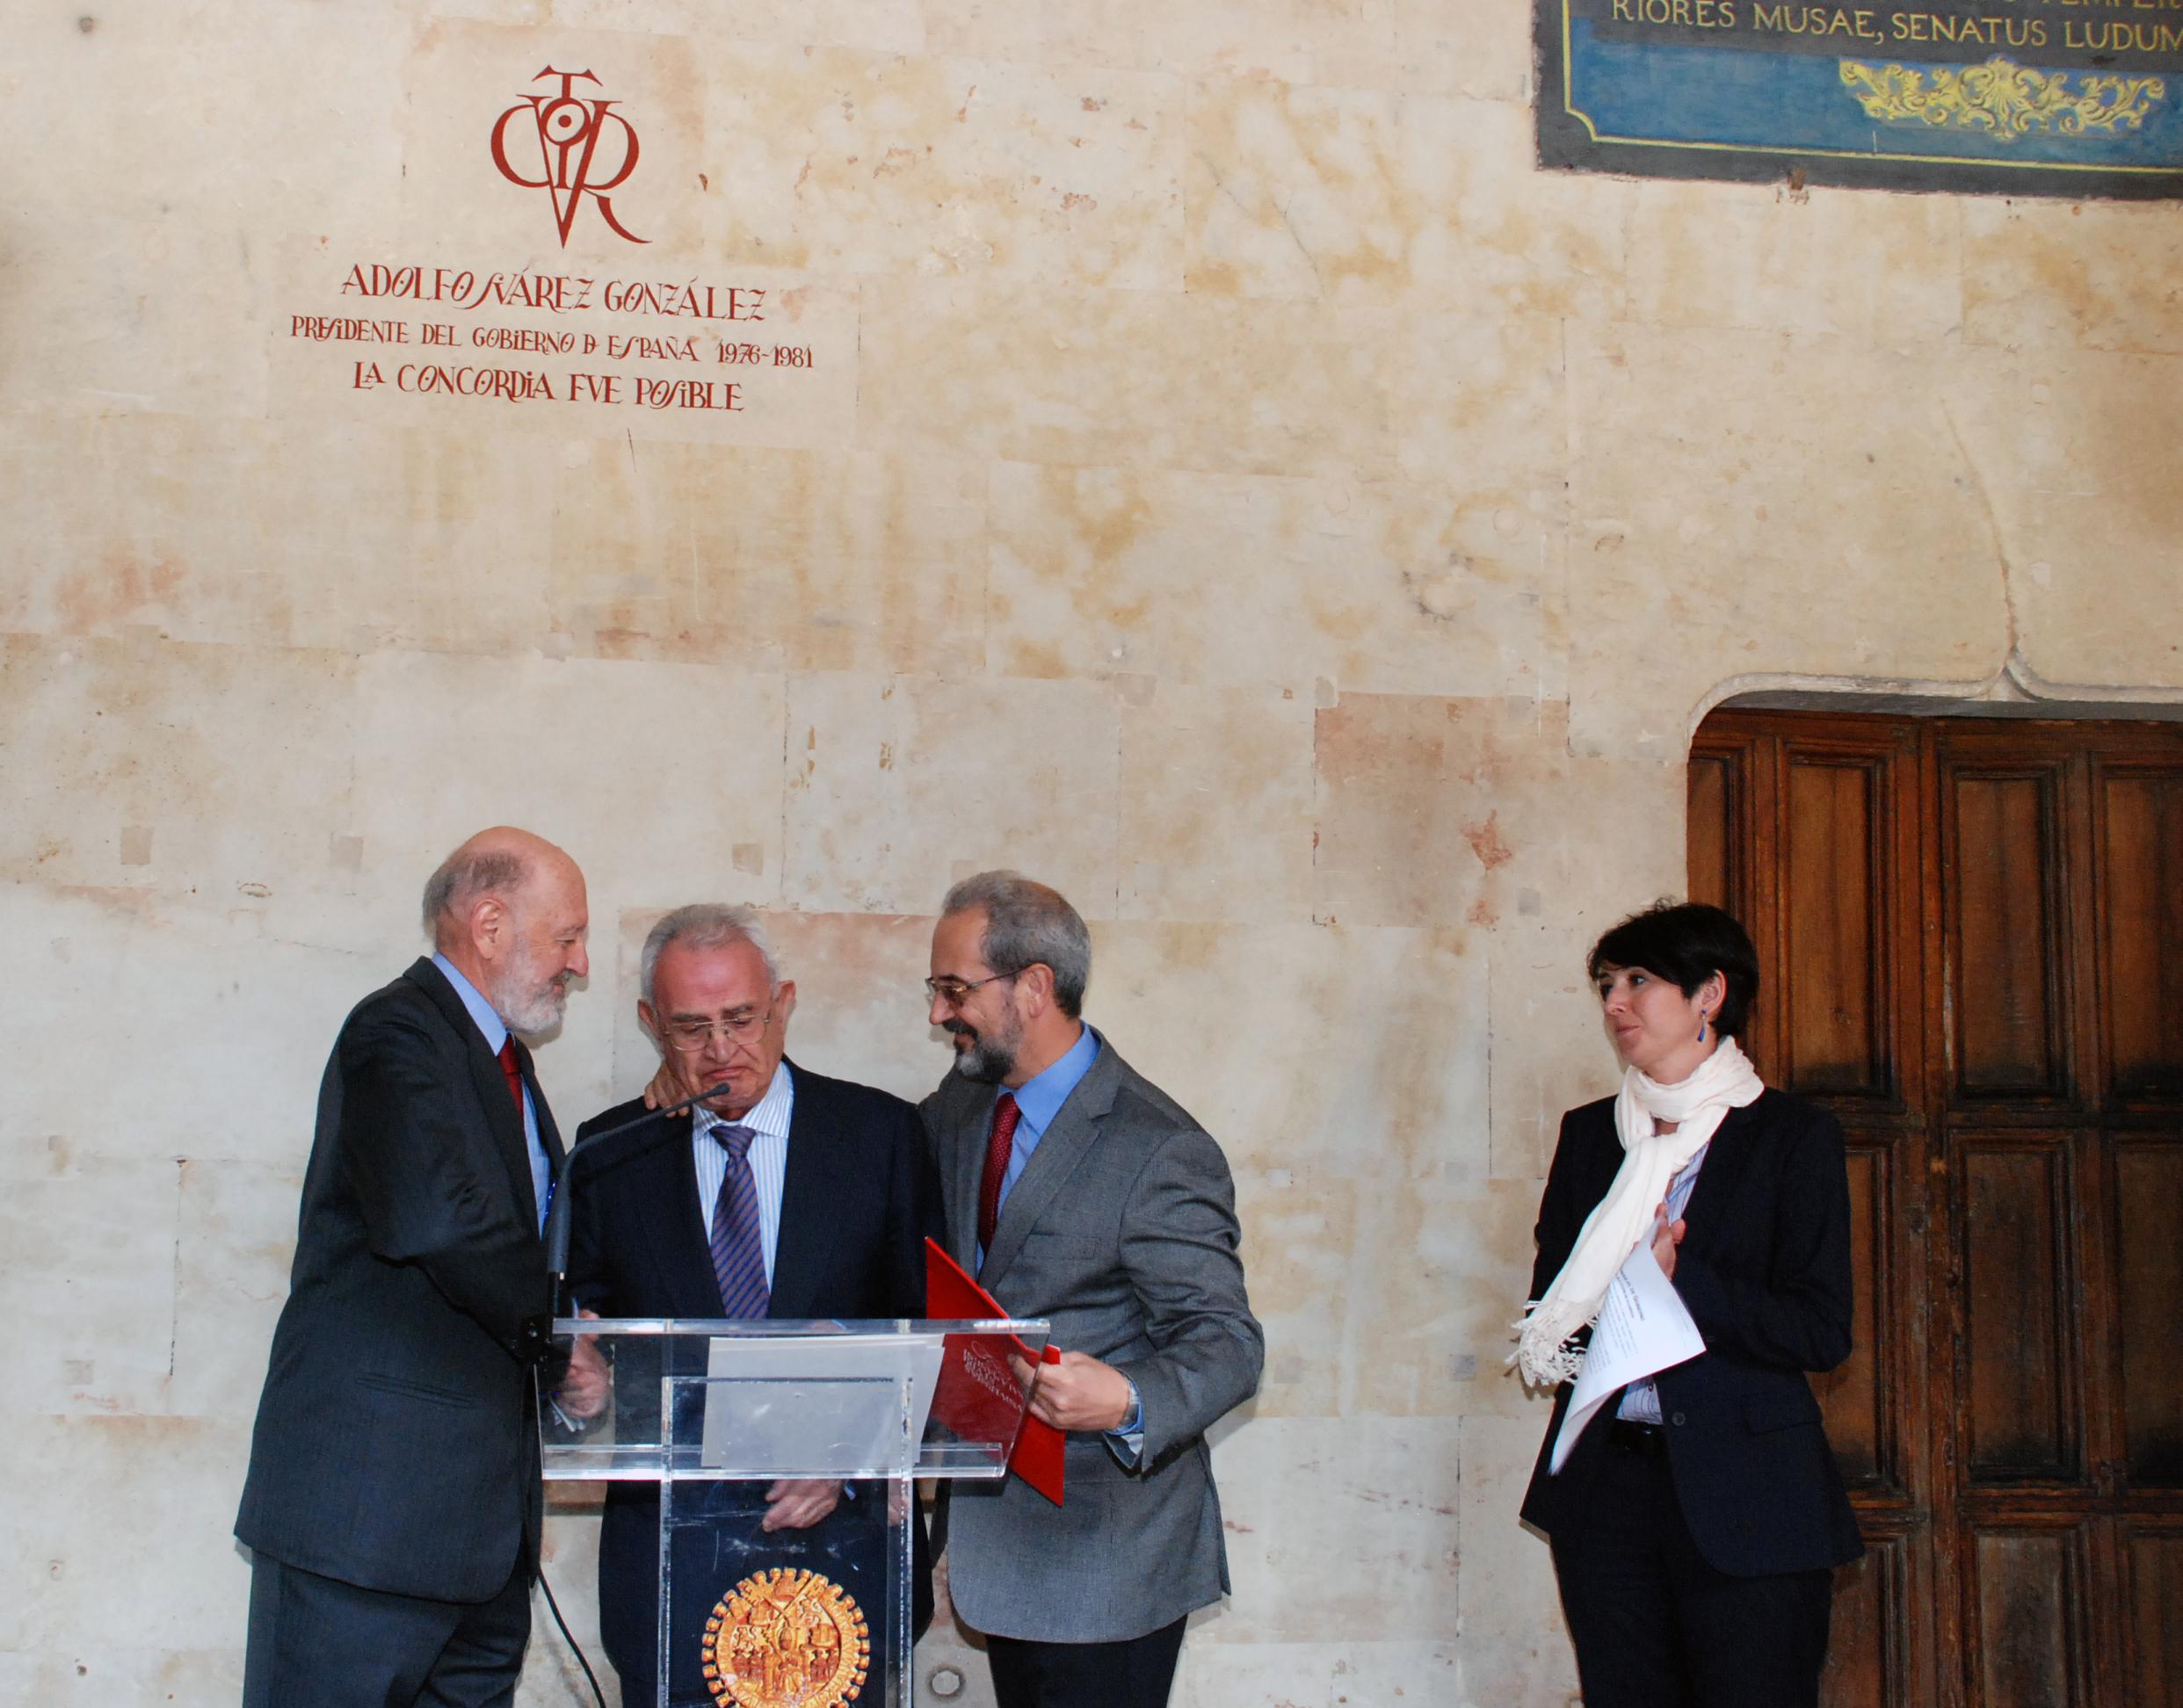 La Universidad de Salamanca rinde homenaje a Adolfo Suárez